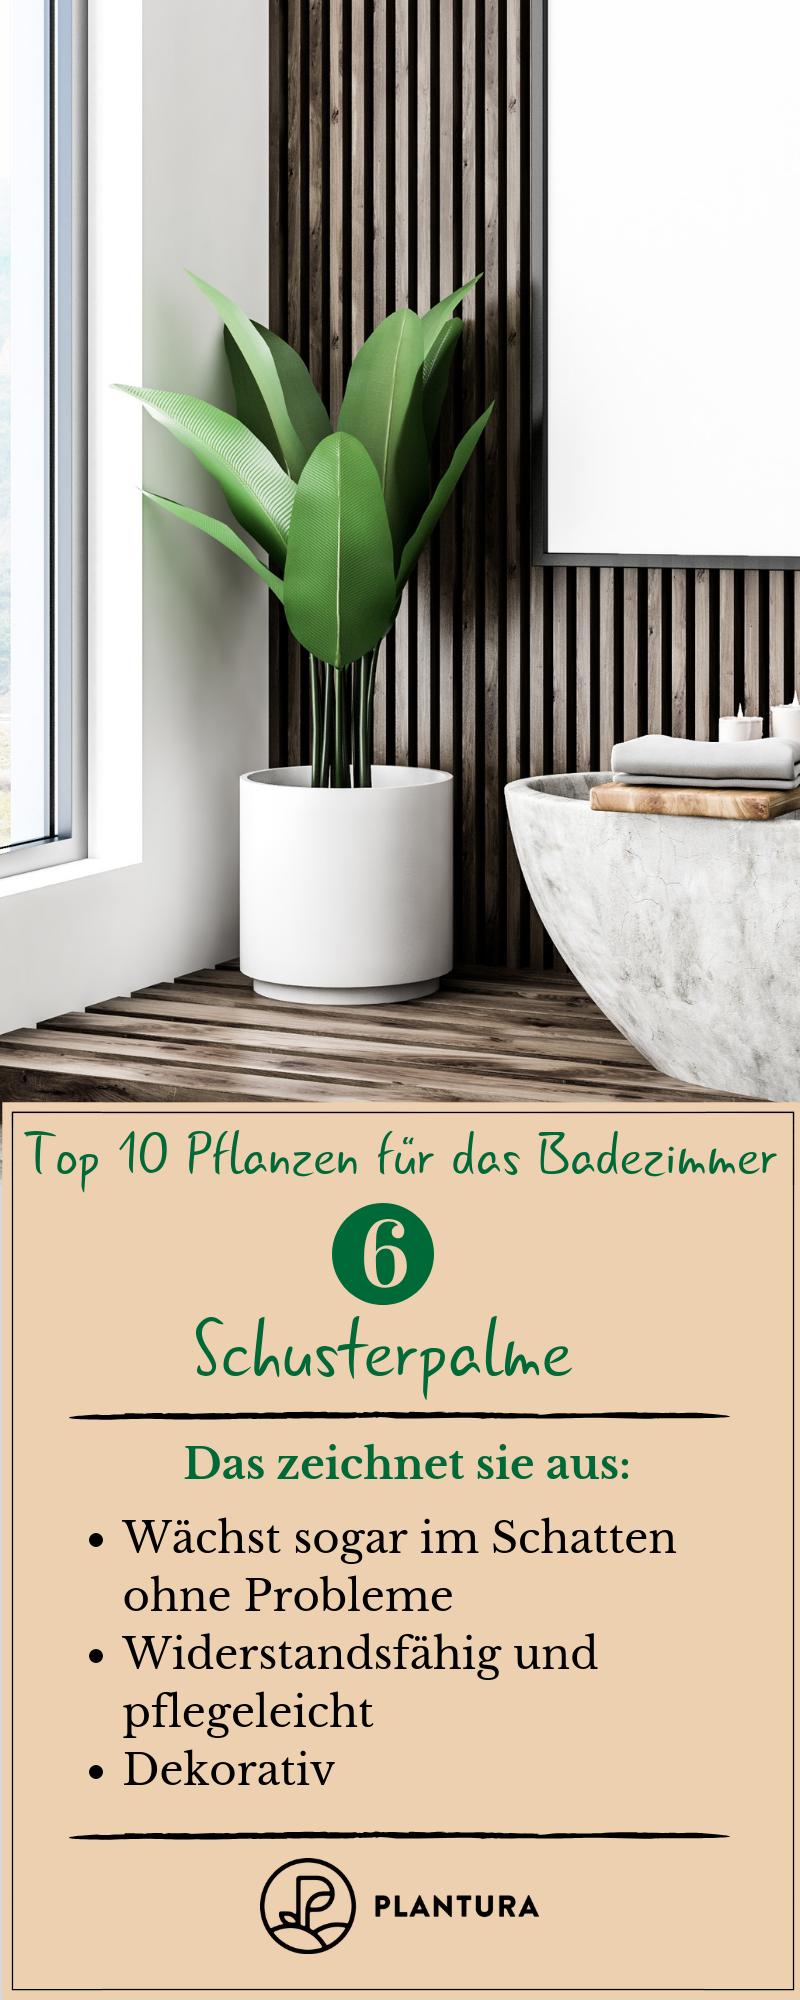 Plants For The Bathroom 10 Types For The Wellness Oasis Plantura Top 10 Plants For The Bathroom 6th Place In 2020 Pflanzen Furs Bad Pflanzen Badezimmerpflanzen